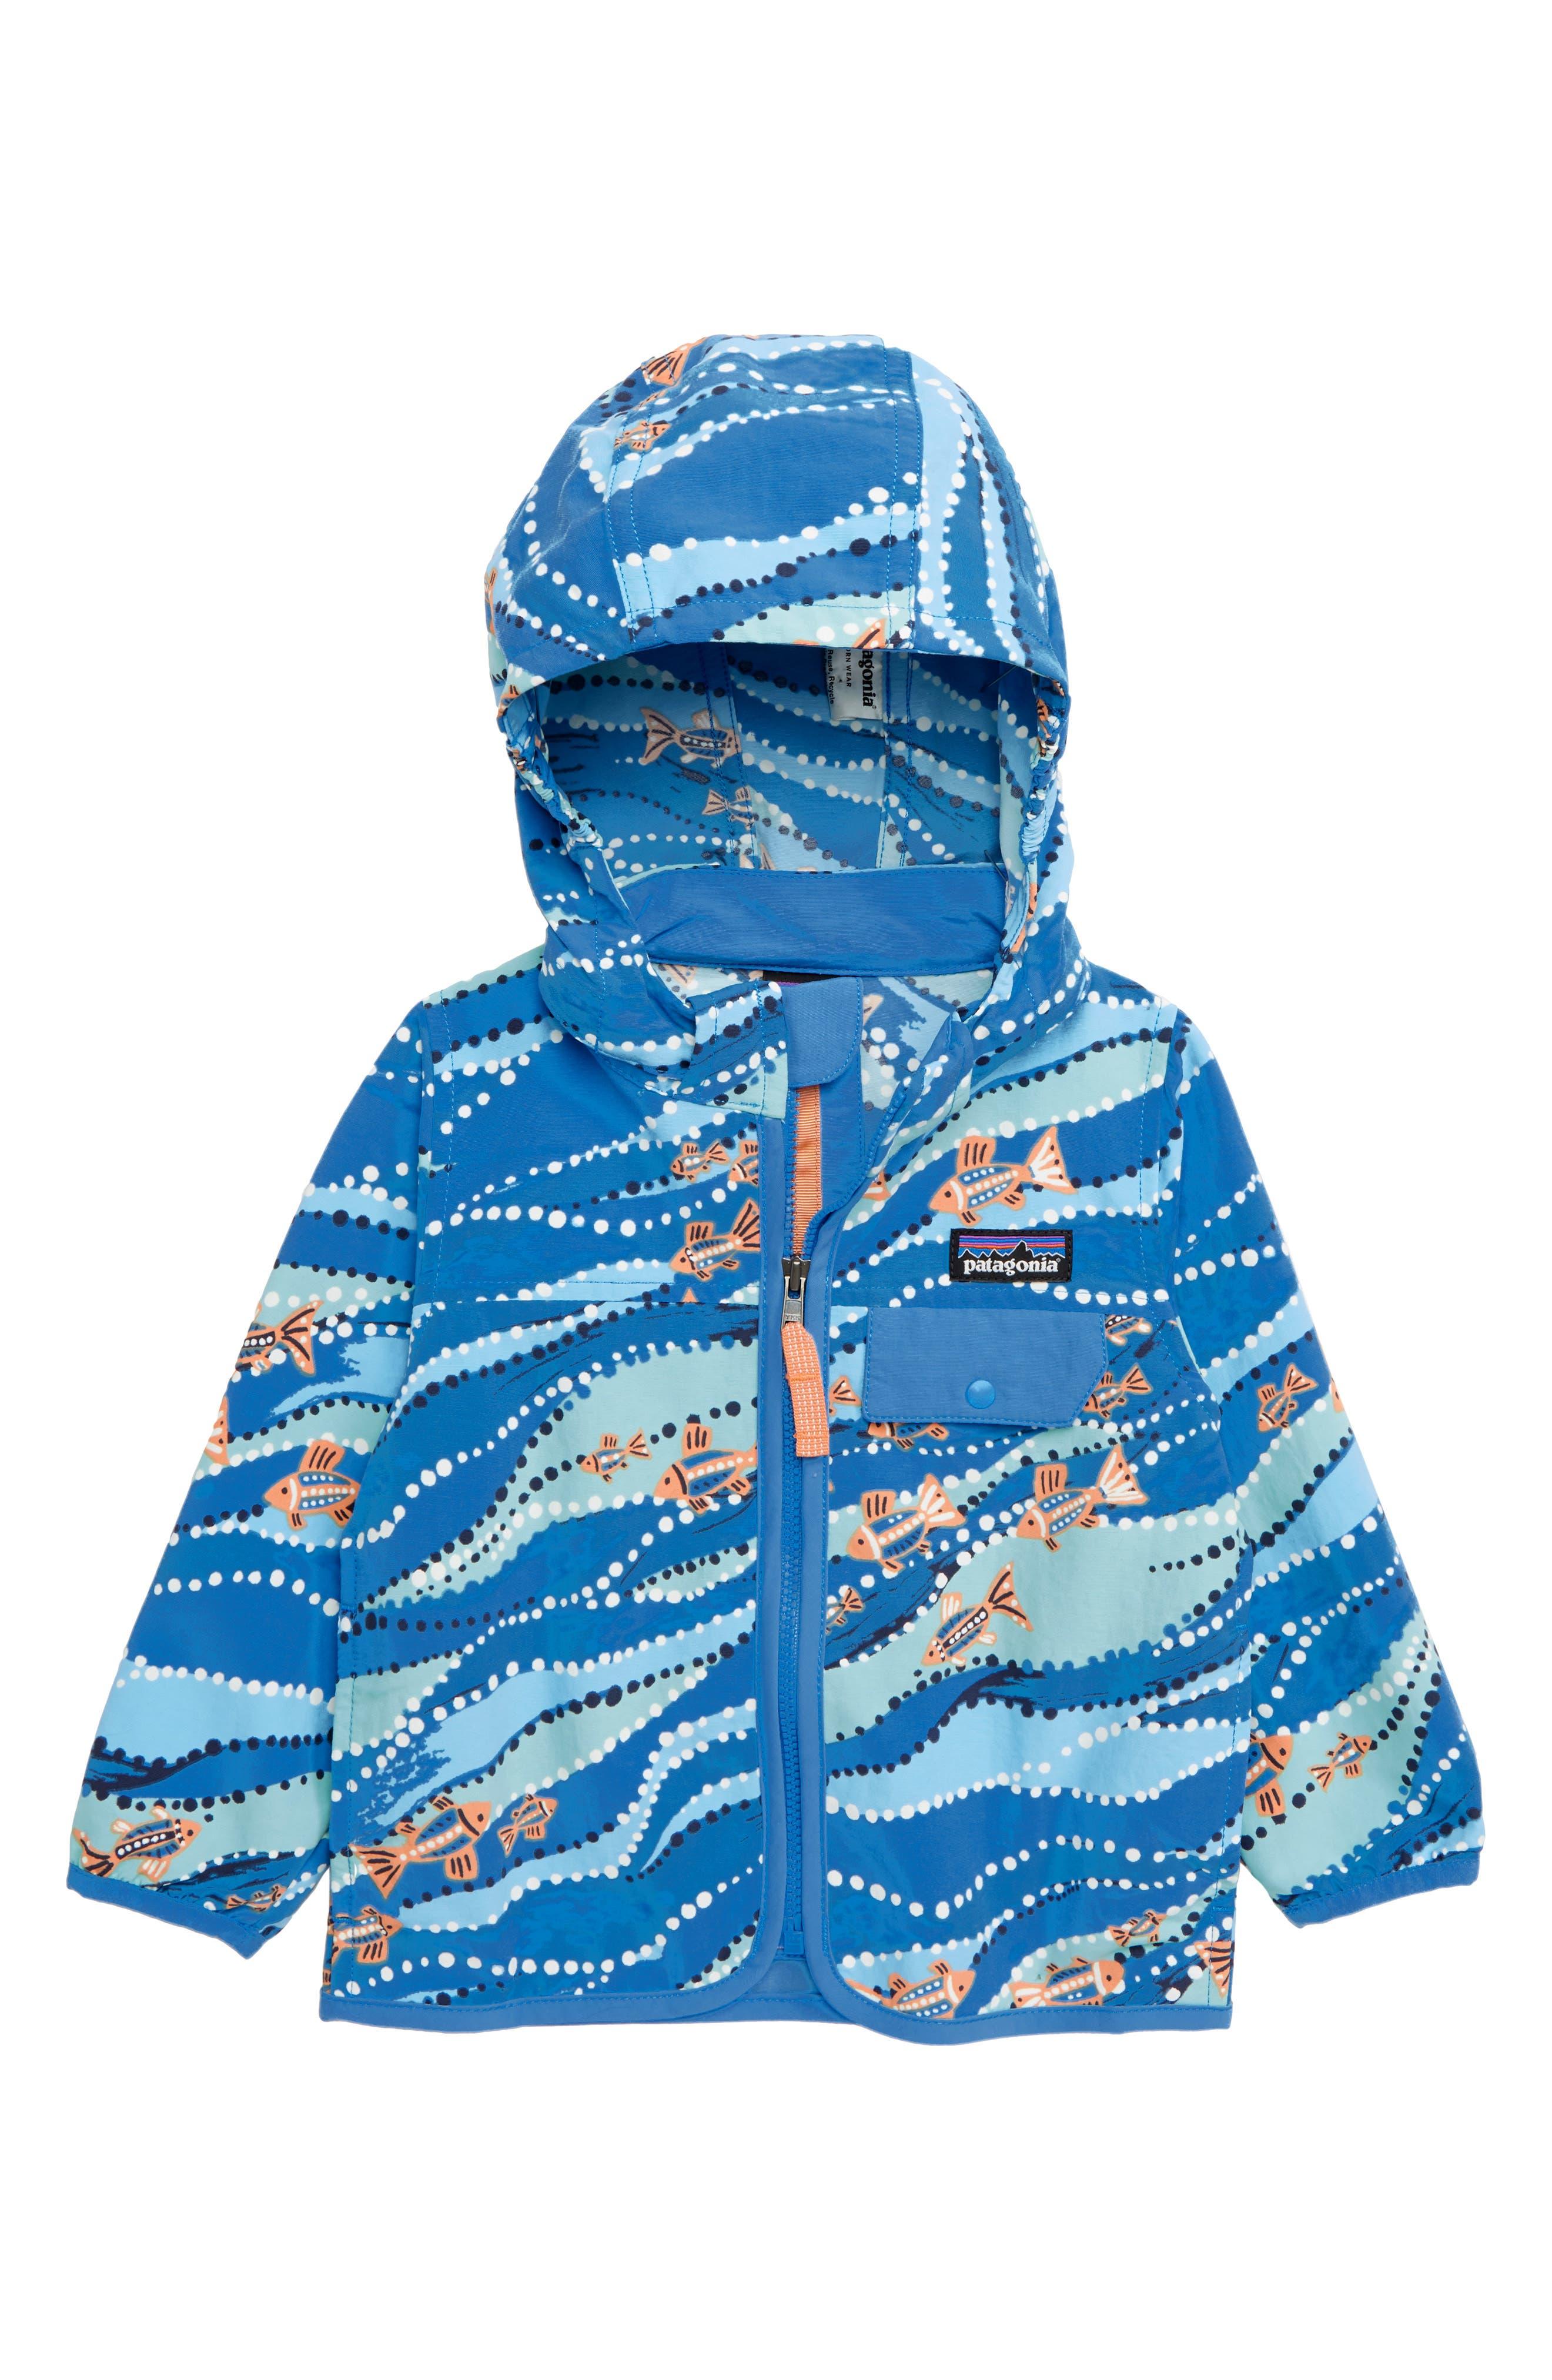 PATAGONIA Baggies<sup>™</sup> Jacket, Main, color, BEPO BELL BAY: PORT BLUE